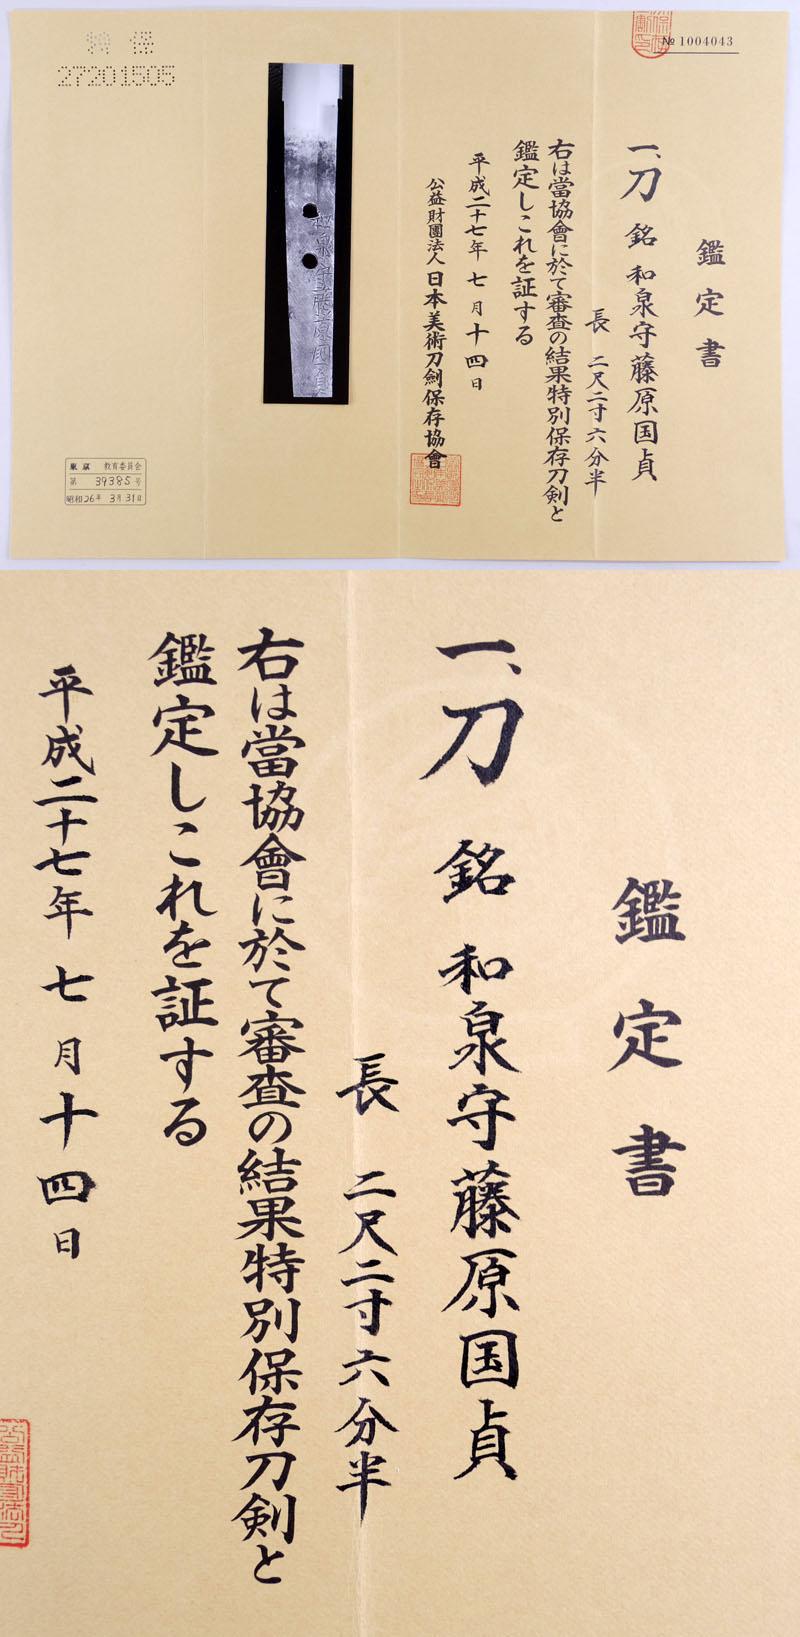 和泉守藤原国貞(親国貞) Picture of Certificate